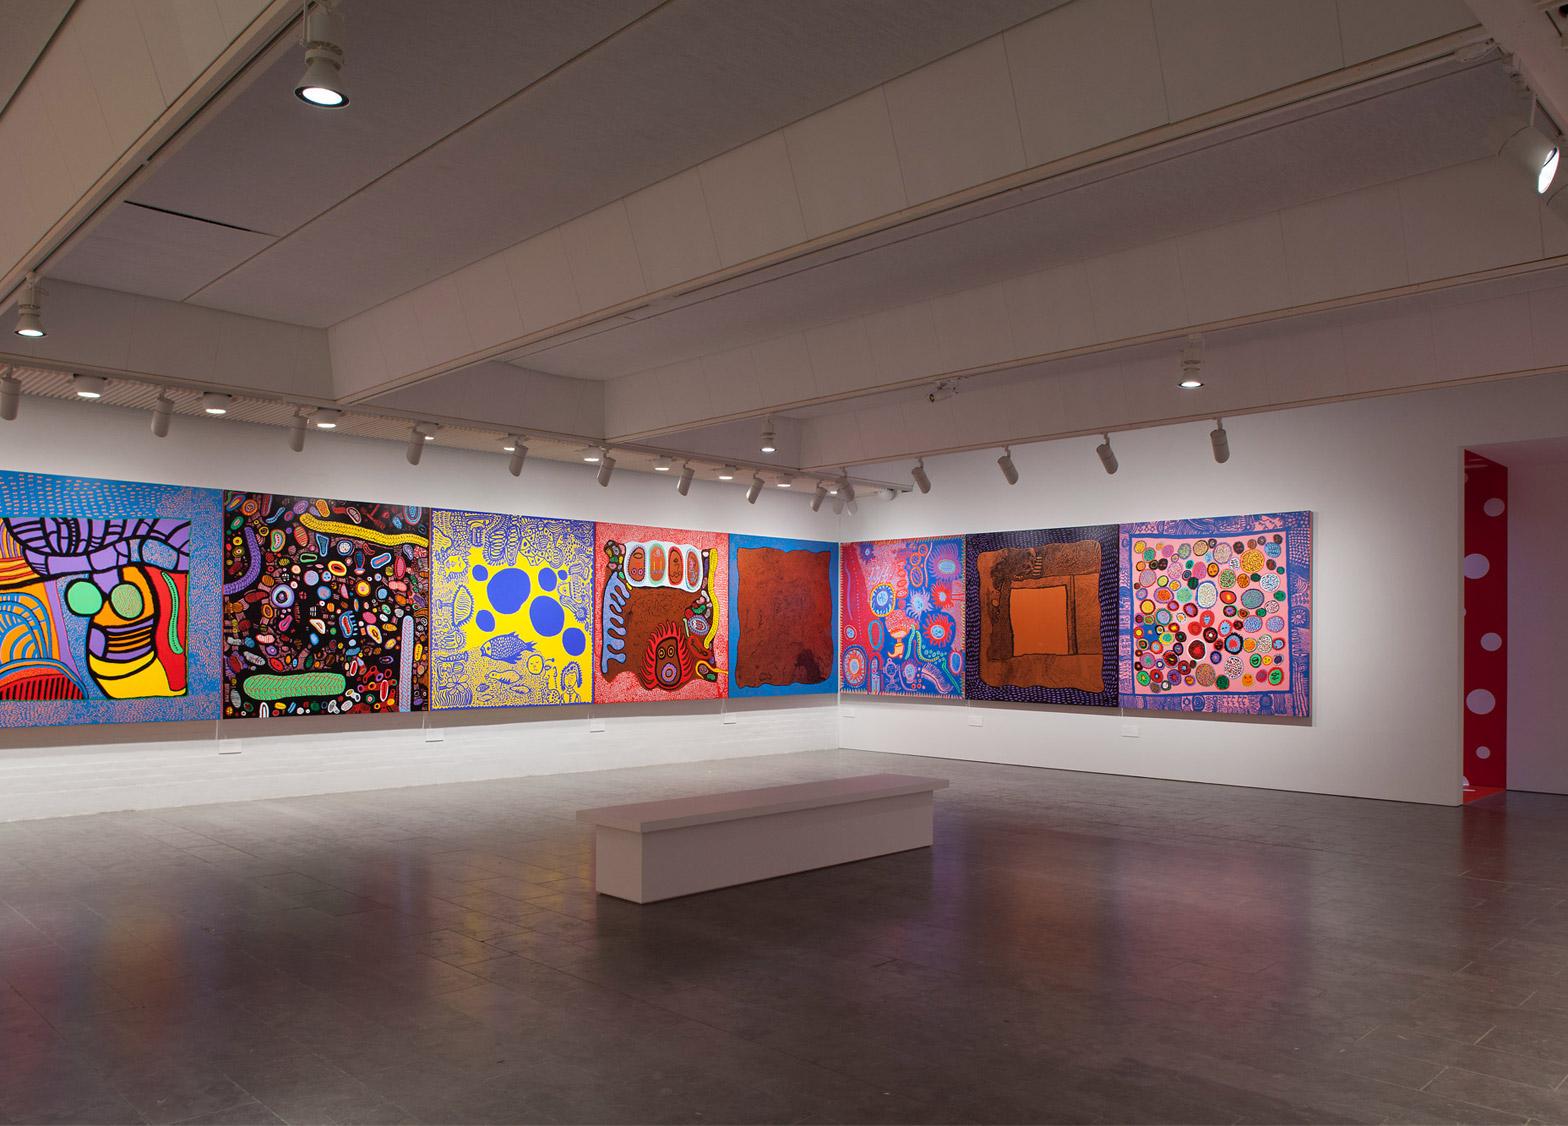 Yayoi Kusama exhibition at Louisiana Museum features six decades of spots